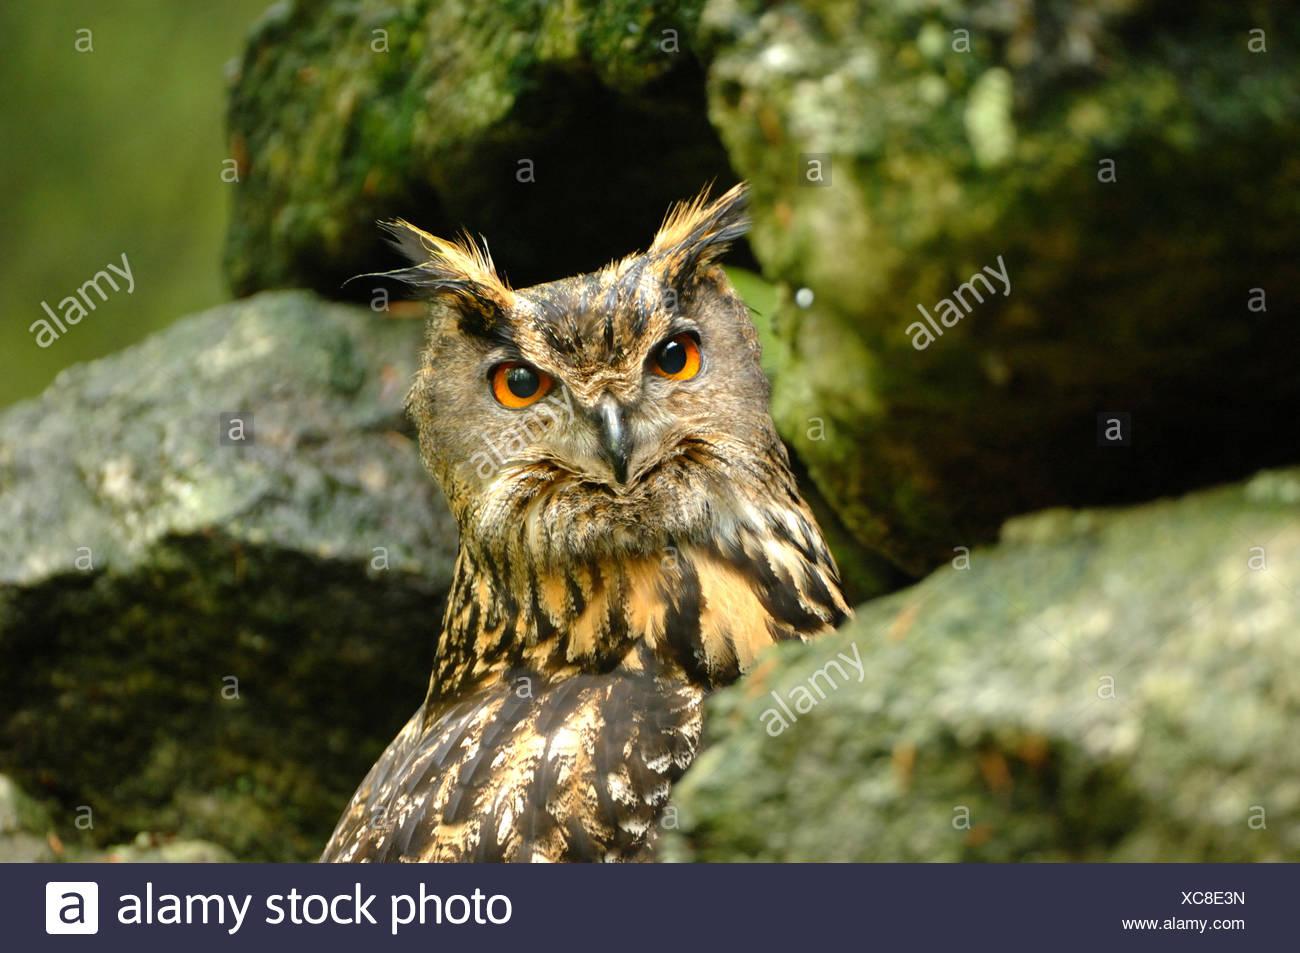 Eagle owl, Bubo bubo, owl, owls, night, bird of prey, birds of prey, bird, birds, peering, animal, animals, Germany, Europe, - Stock Image